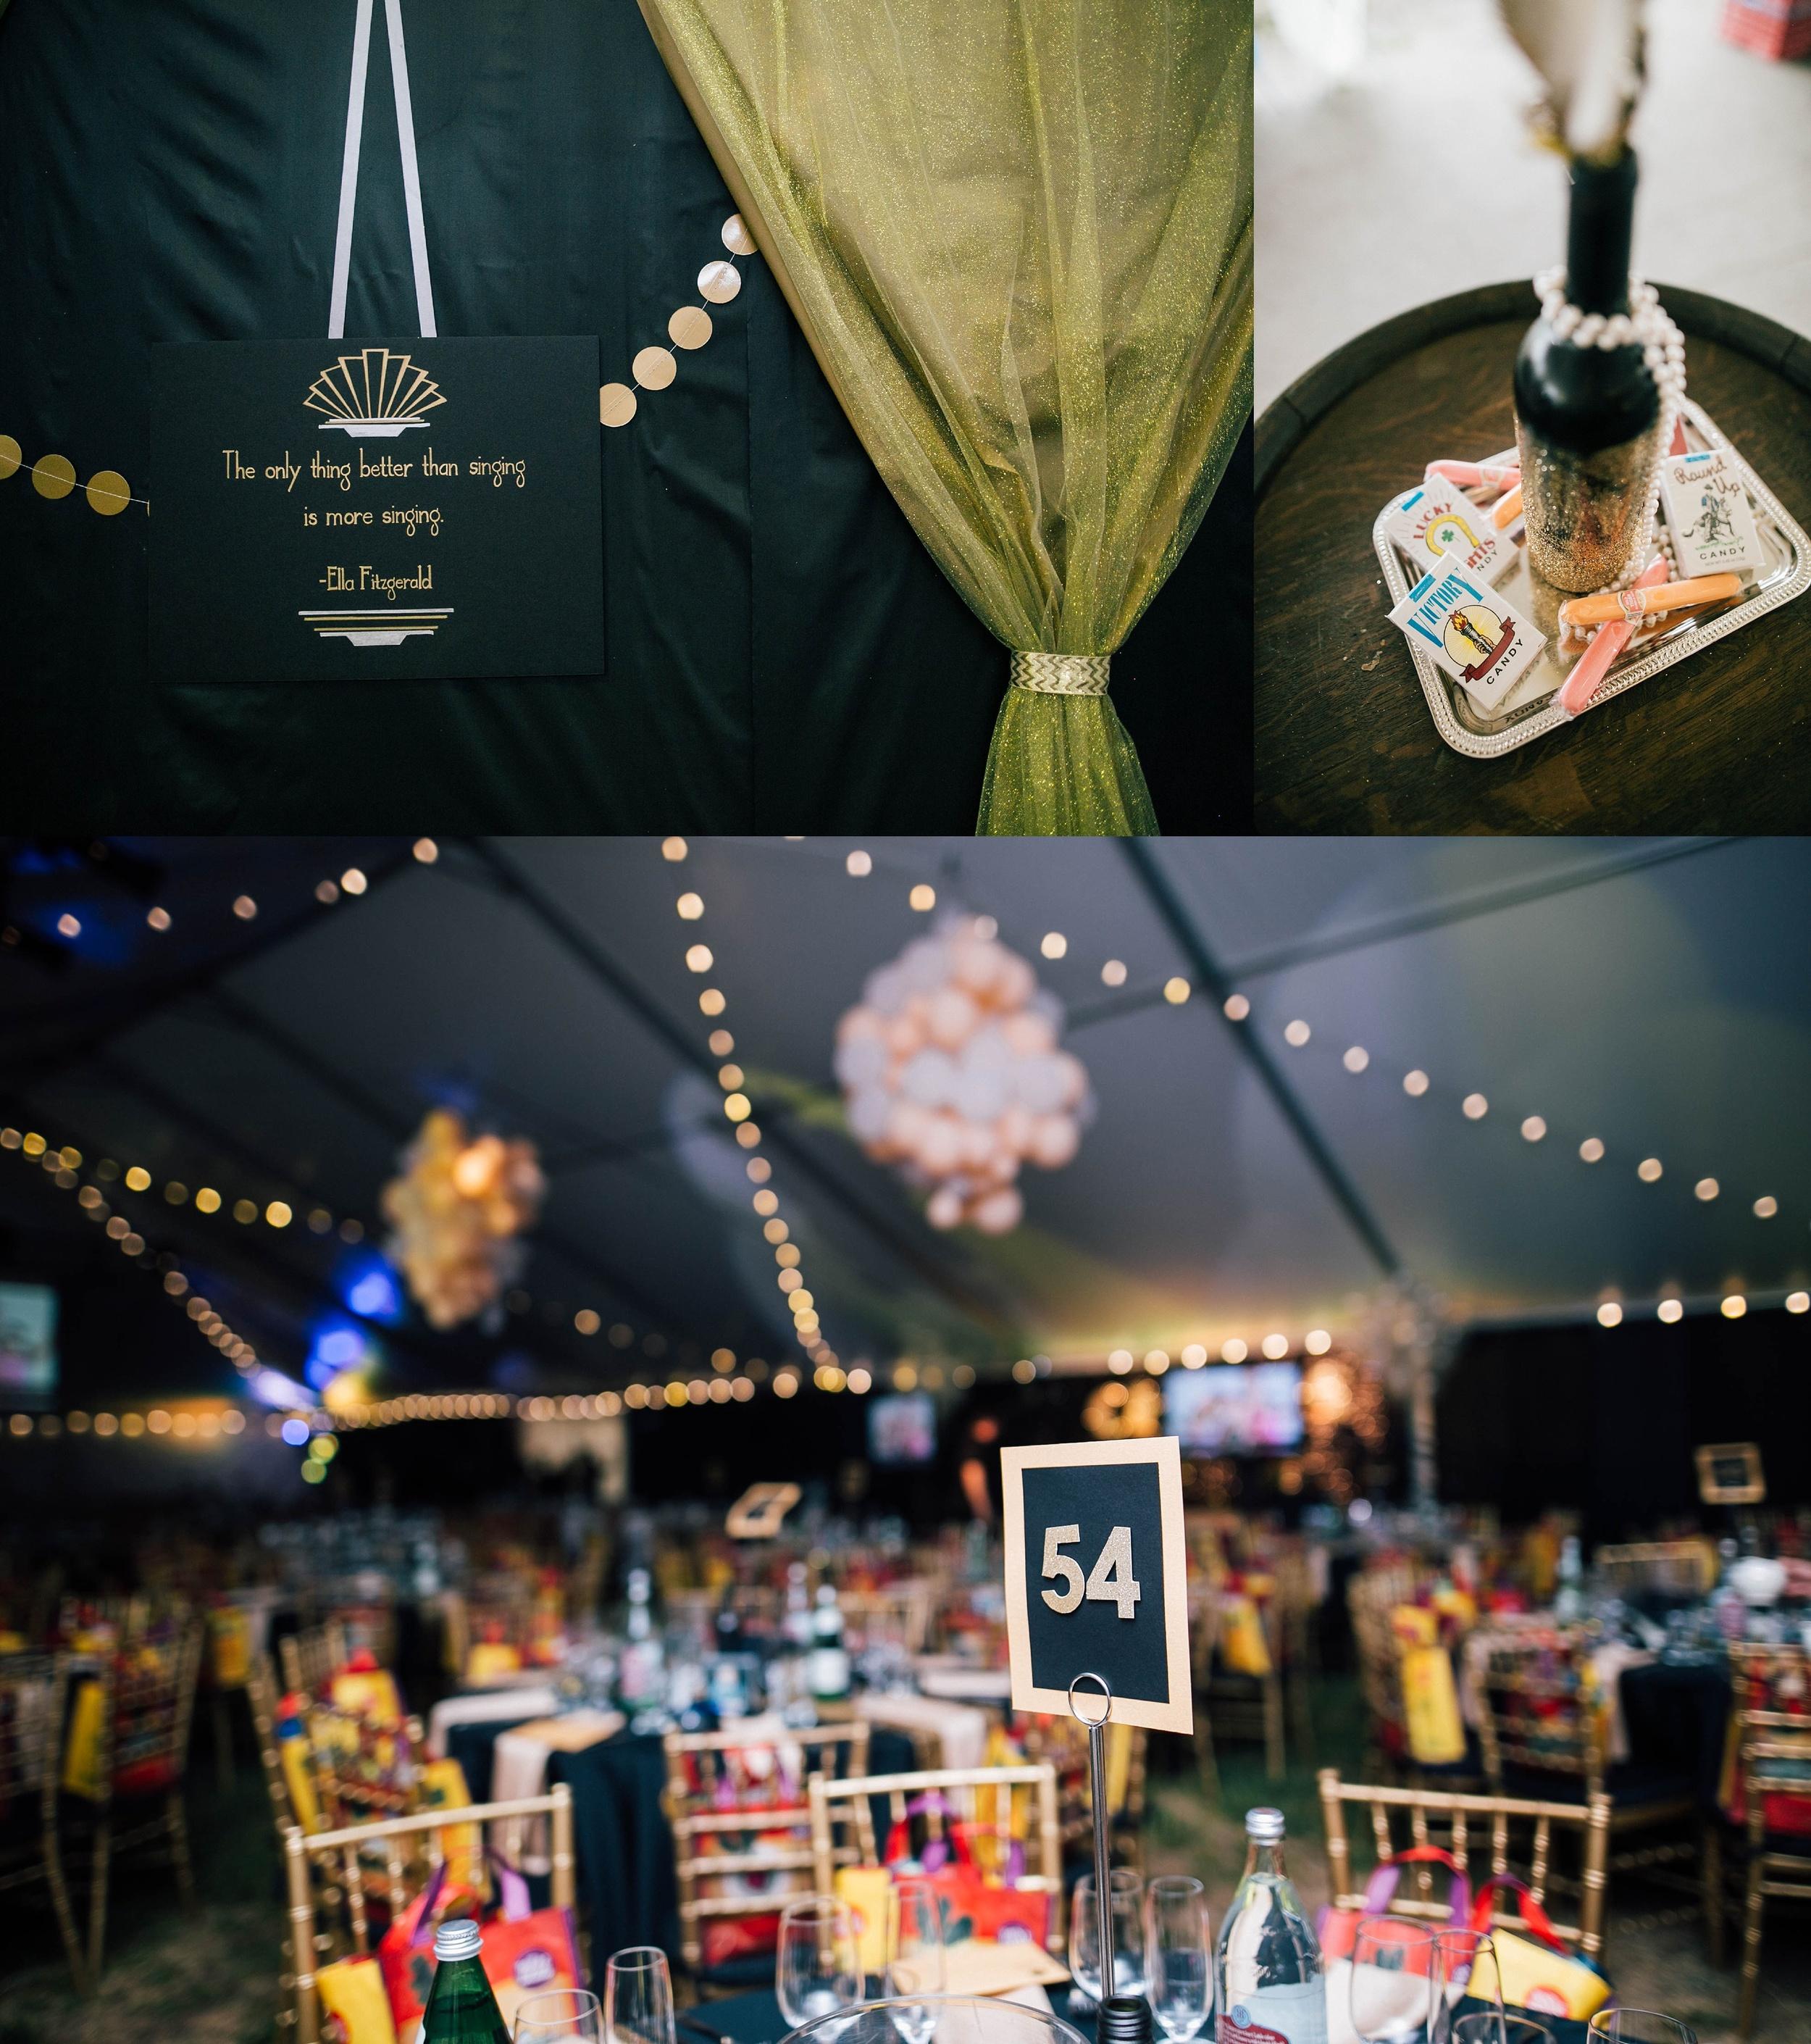 ashley_vos_seattle_wedding_photographer_0018.jpg